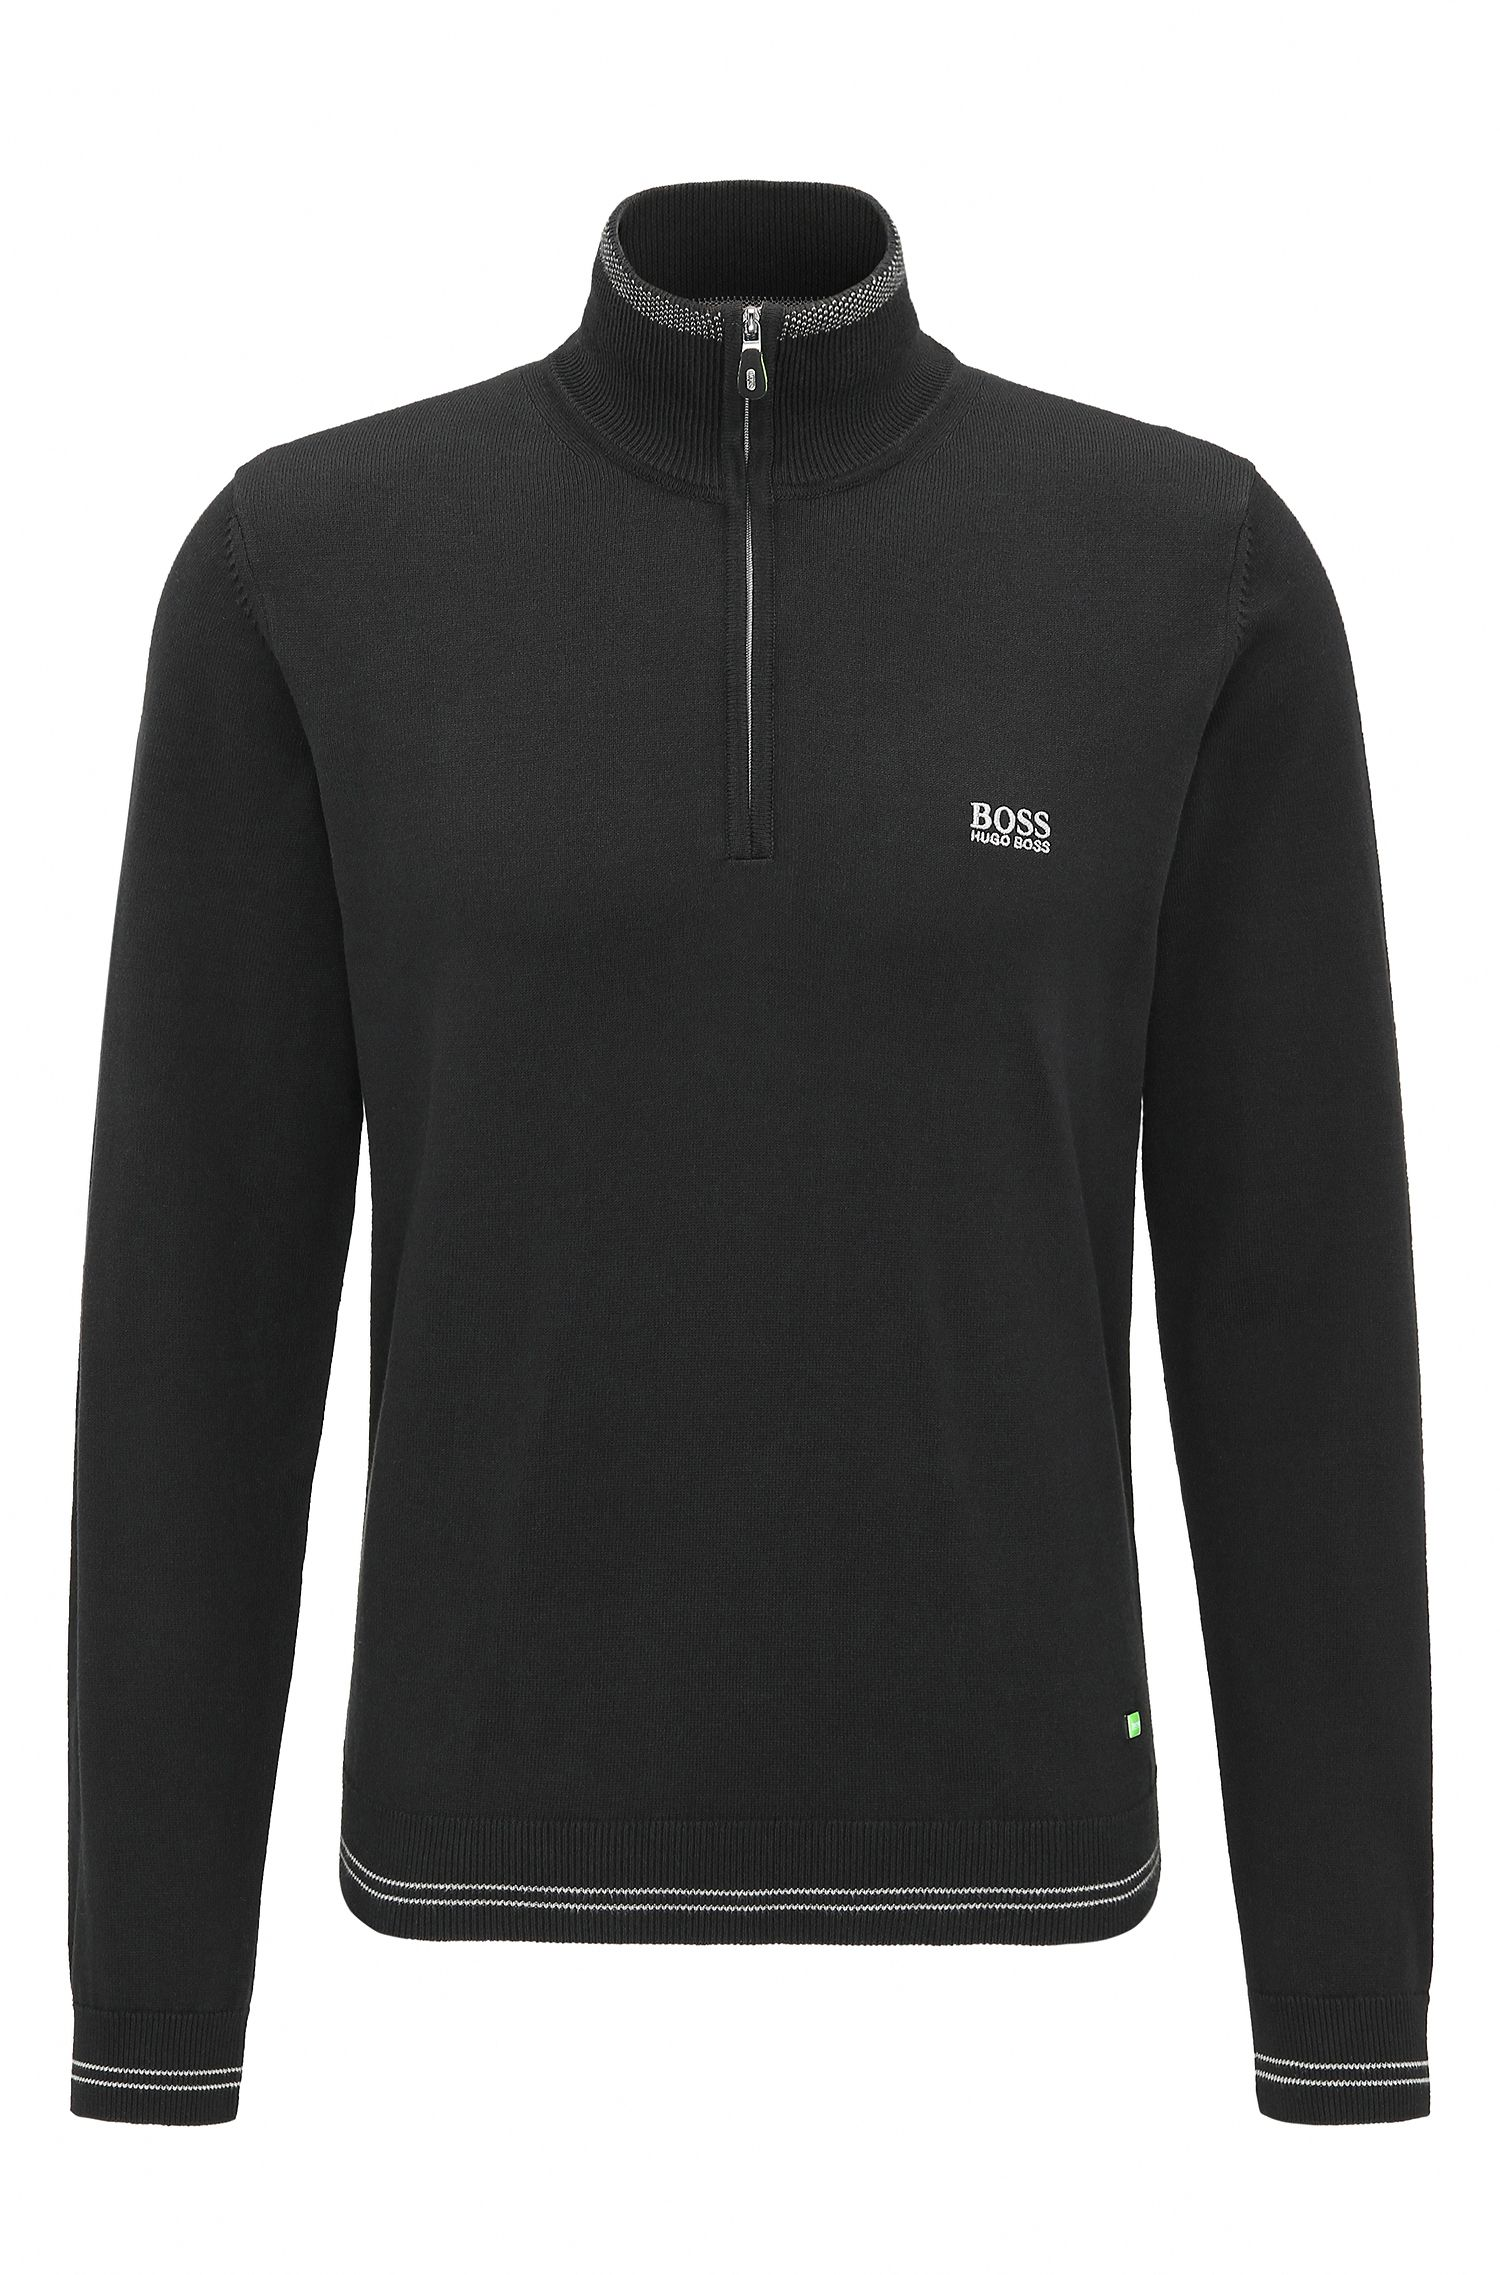 Cotton Blend Half-Zip Sweater | Zime W17